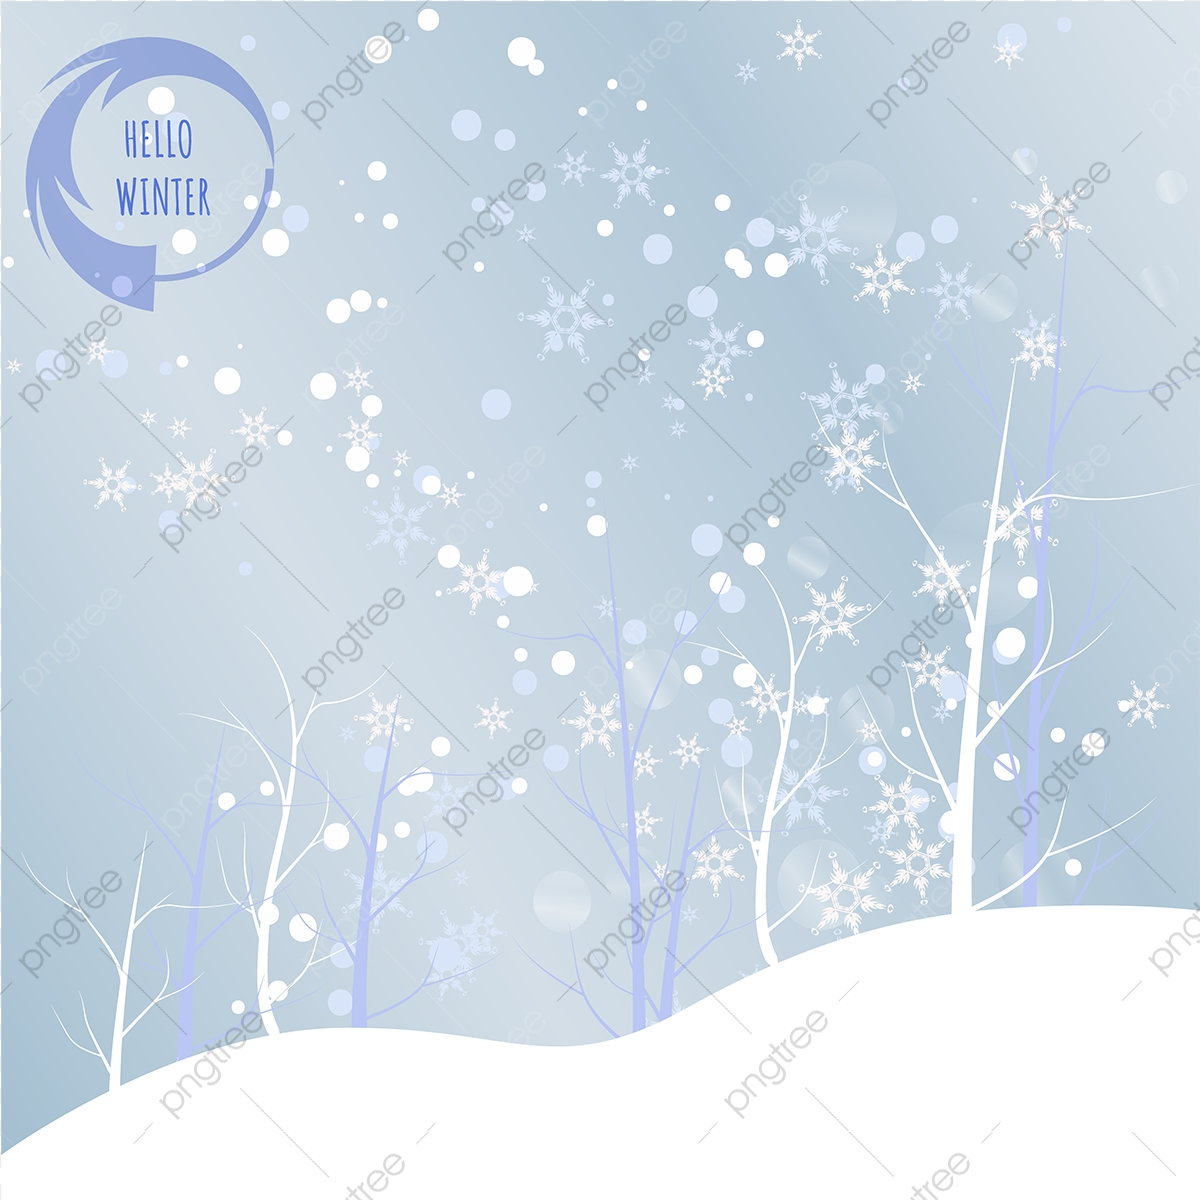 Hola Invierno Background 01 Antecedentes Azul Hola Invierno PNG 1200x1200